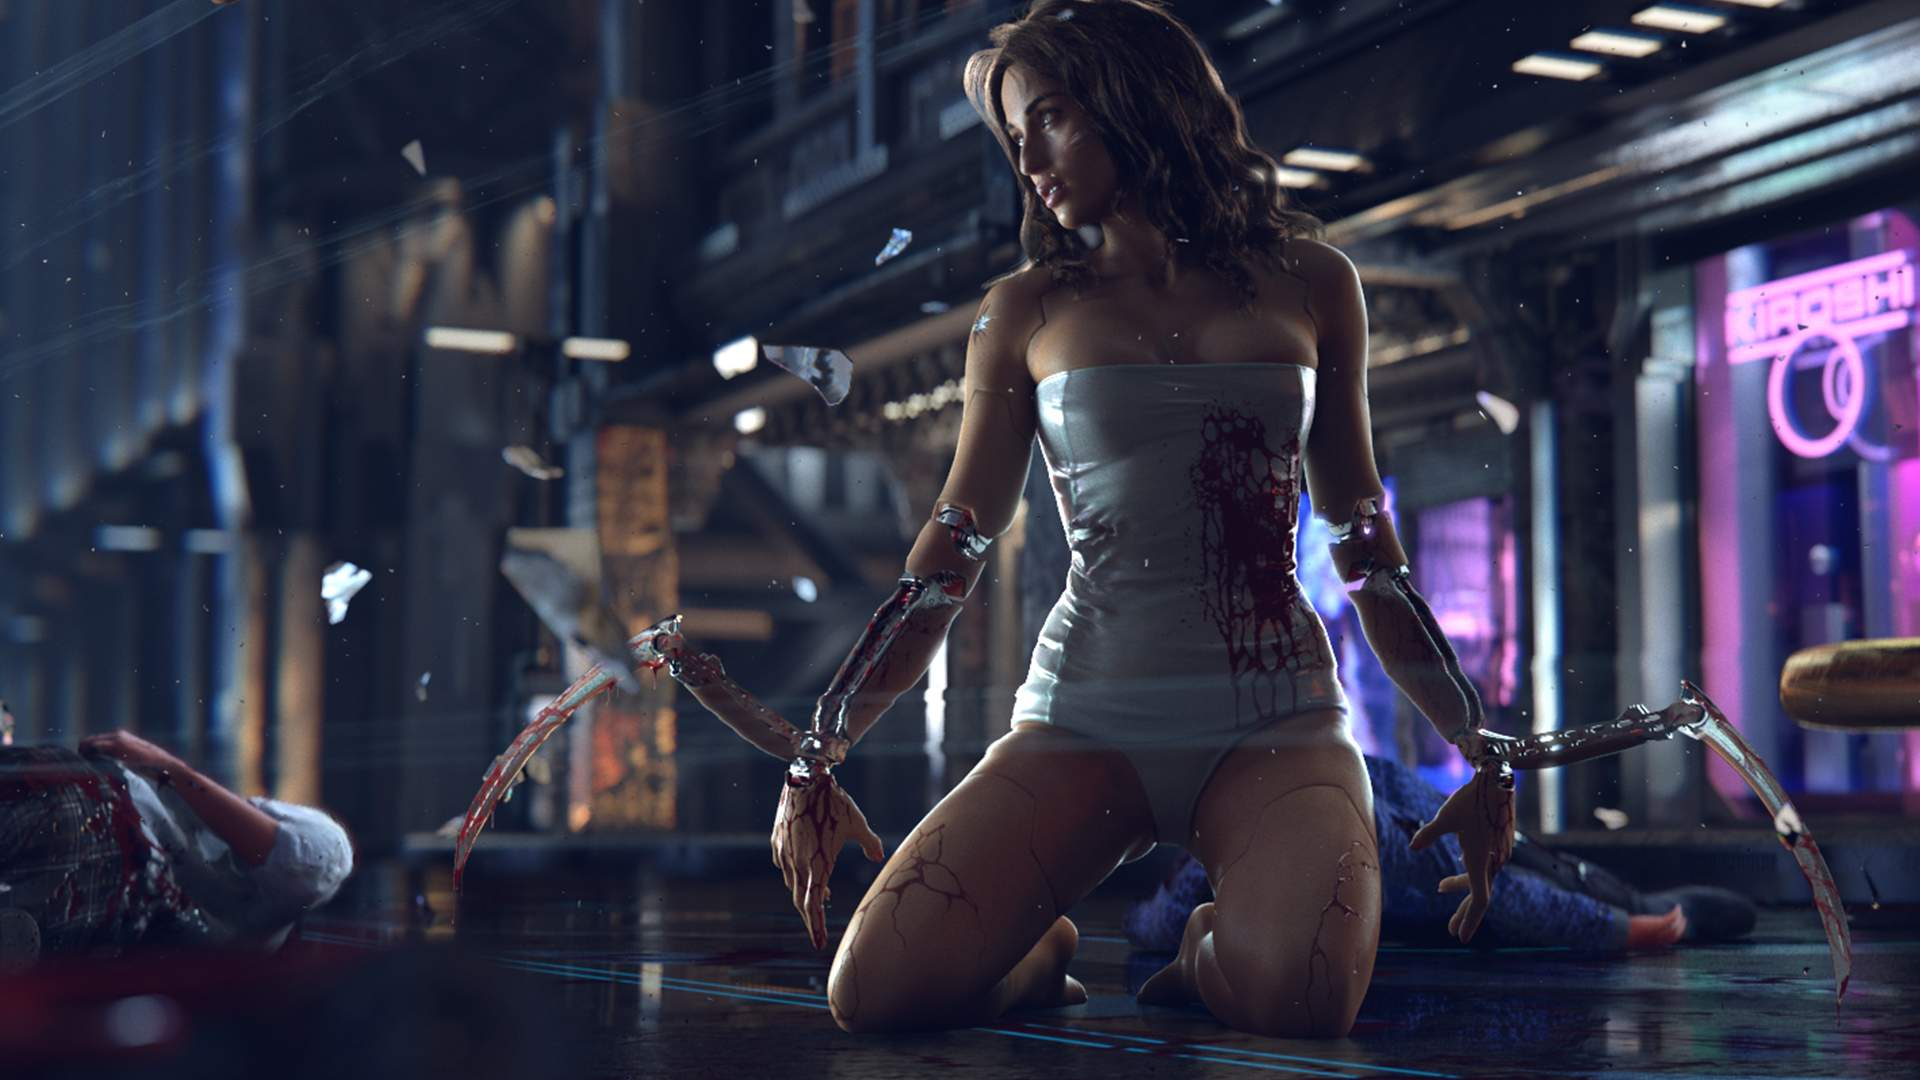 Утечка: 4 минуты геймплея Cyberpunk 2077 от 2013 года